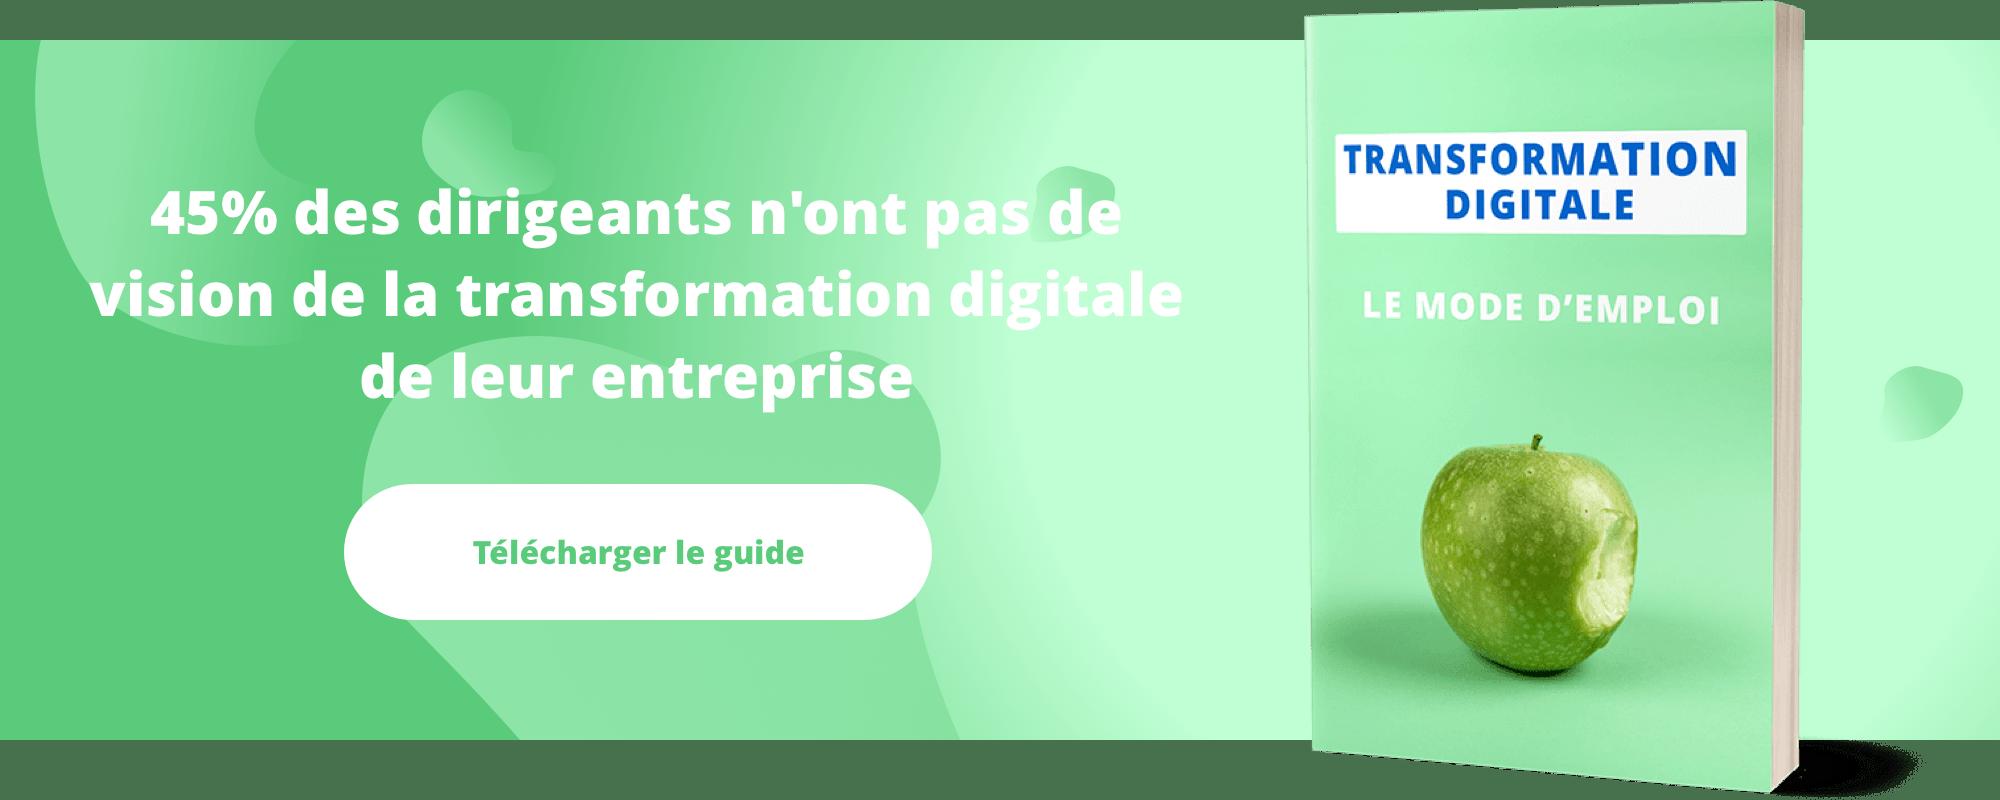 transfo-ebook-agence-digitale-orbiteo